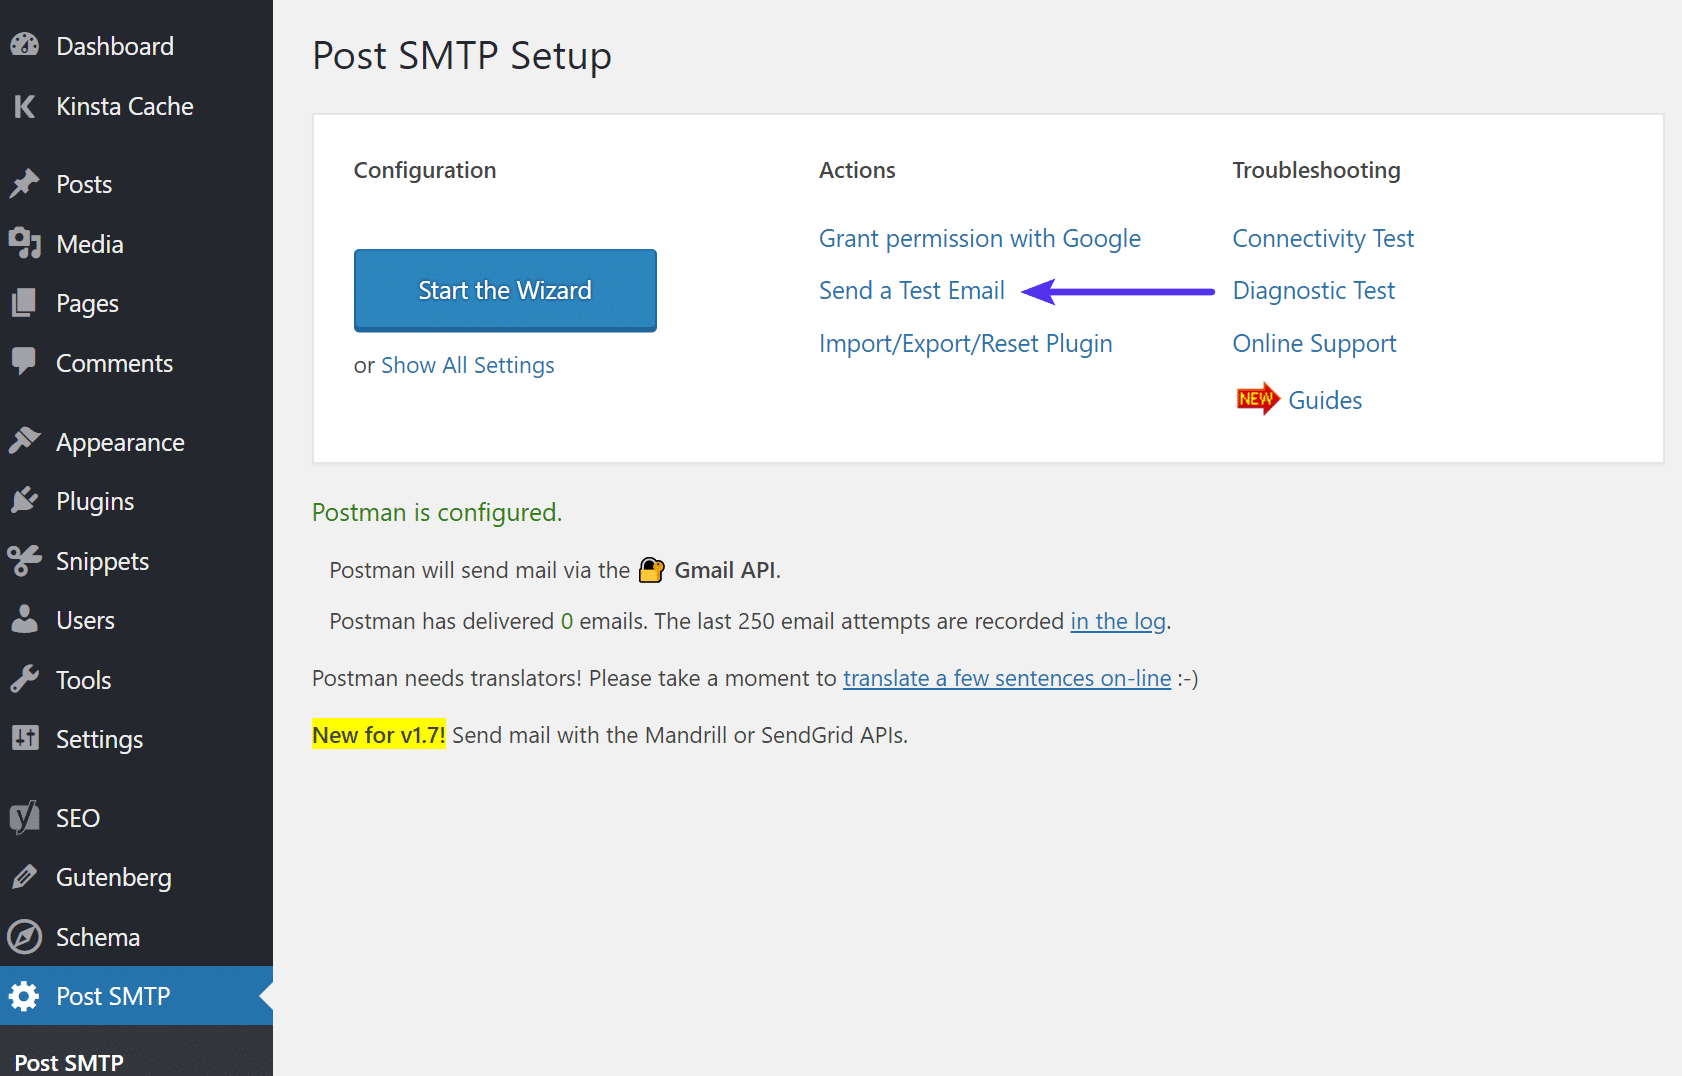 Post SMTP test e-mail